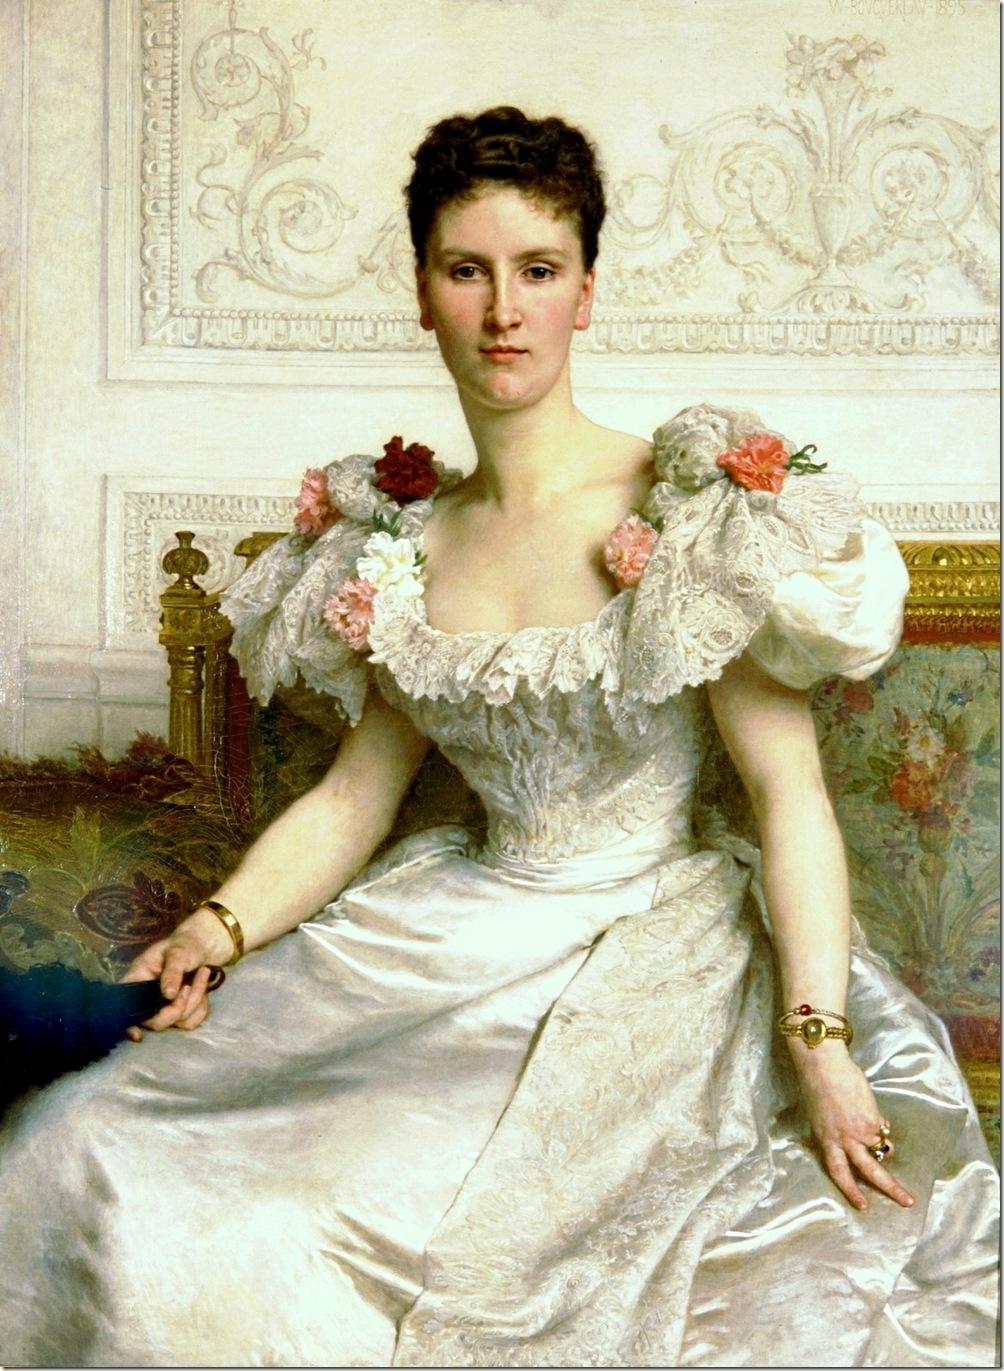 bouguereau_william_madame_la_comtesse_de_cambaceresMadame la Comtesse de Cambaceres [Madam the Countess of Cambaceres]1895